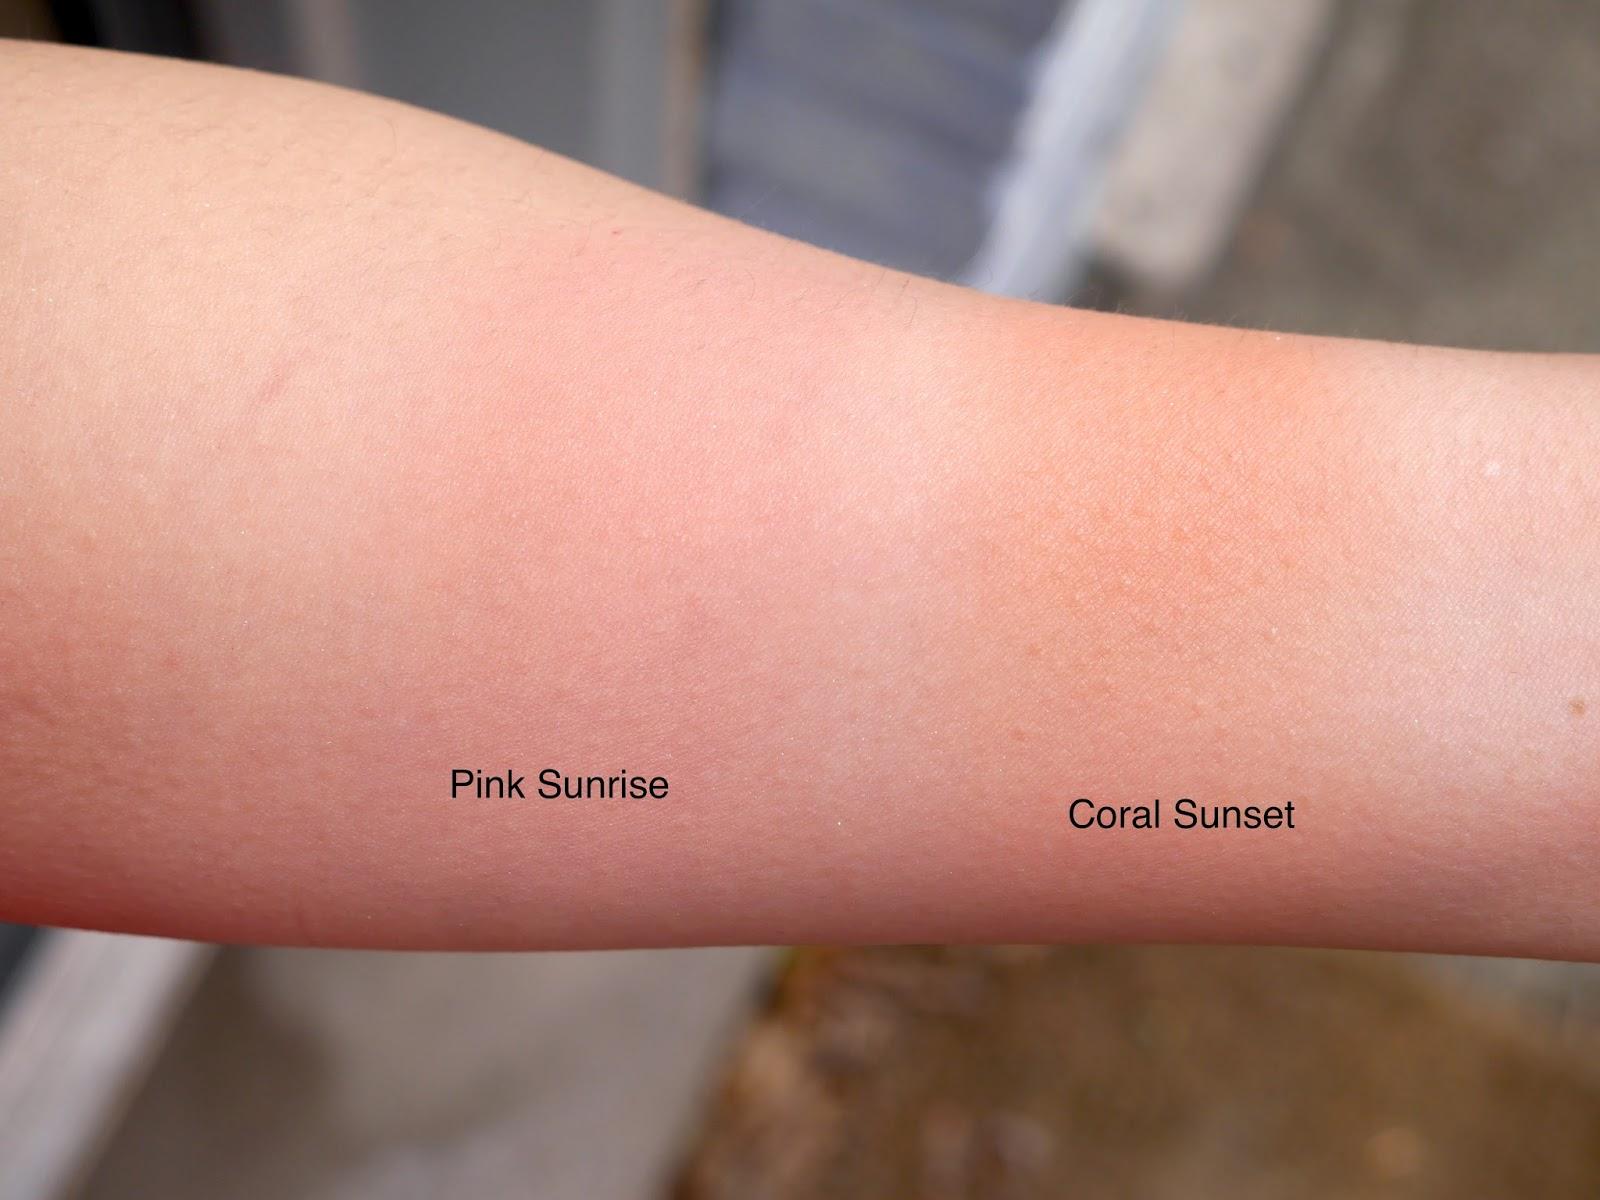 dior coral sunset pink sunrise blush swatch